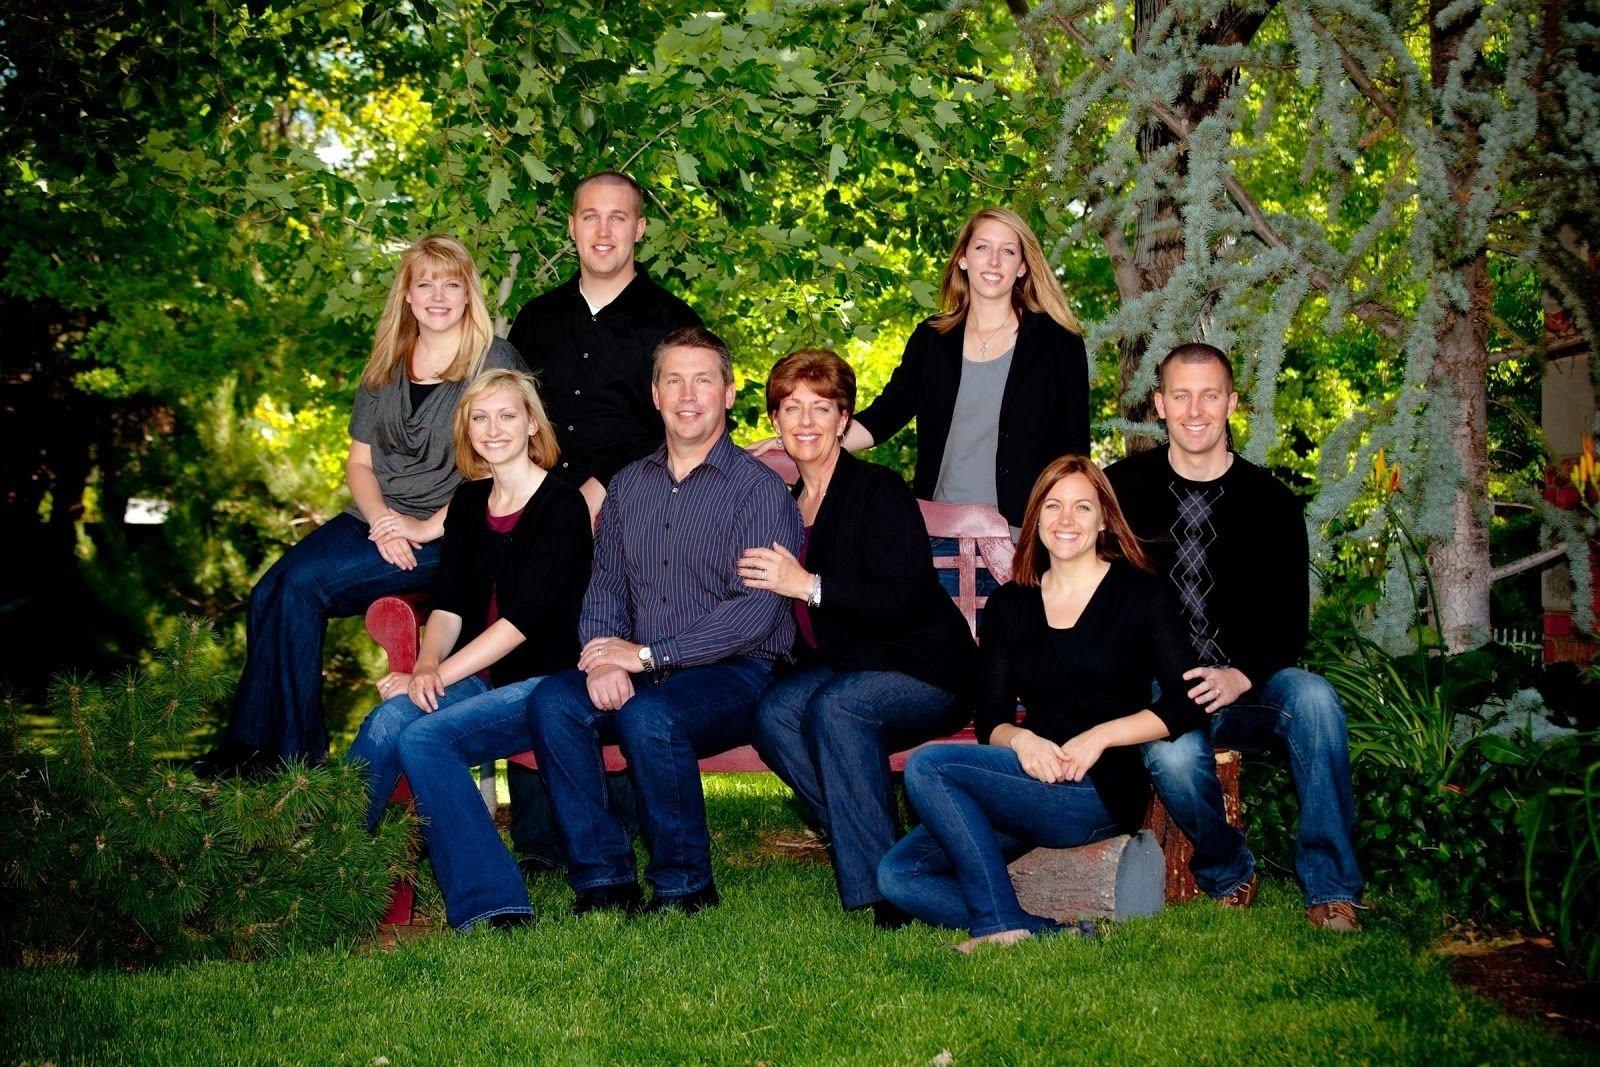 10 Attractive Outdoor Family Photo Shoot Ideas cute outside family photo ideas ideas family photography ideas 1 2020